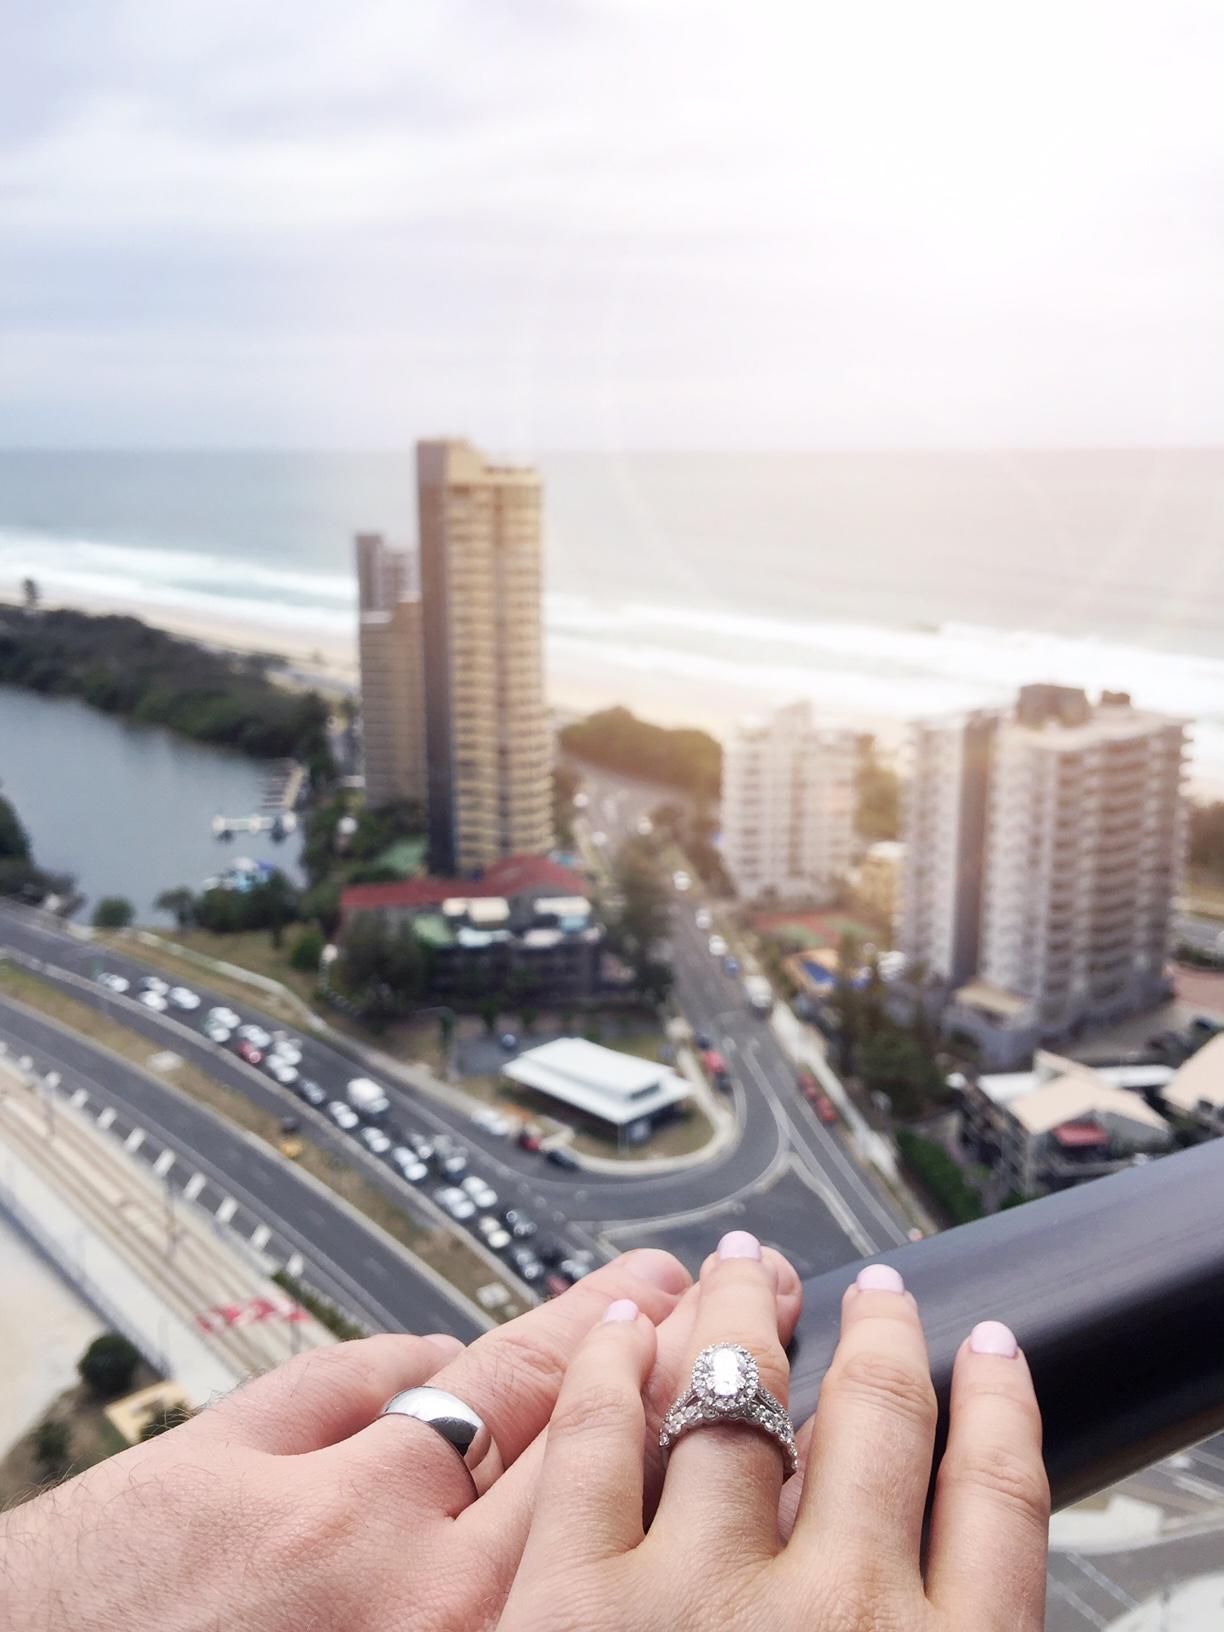 surfers paradise marriott resort and spa gold coast australia beach honeymoon romantic couples holiday luxury vacation oval engagement ring diamond wedding band